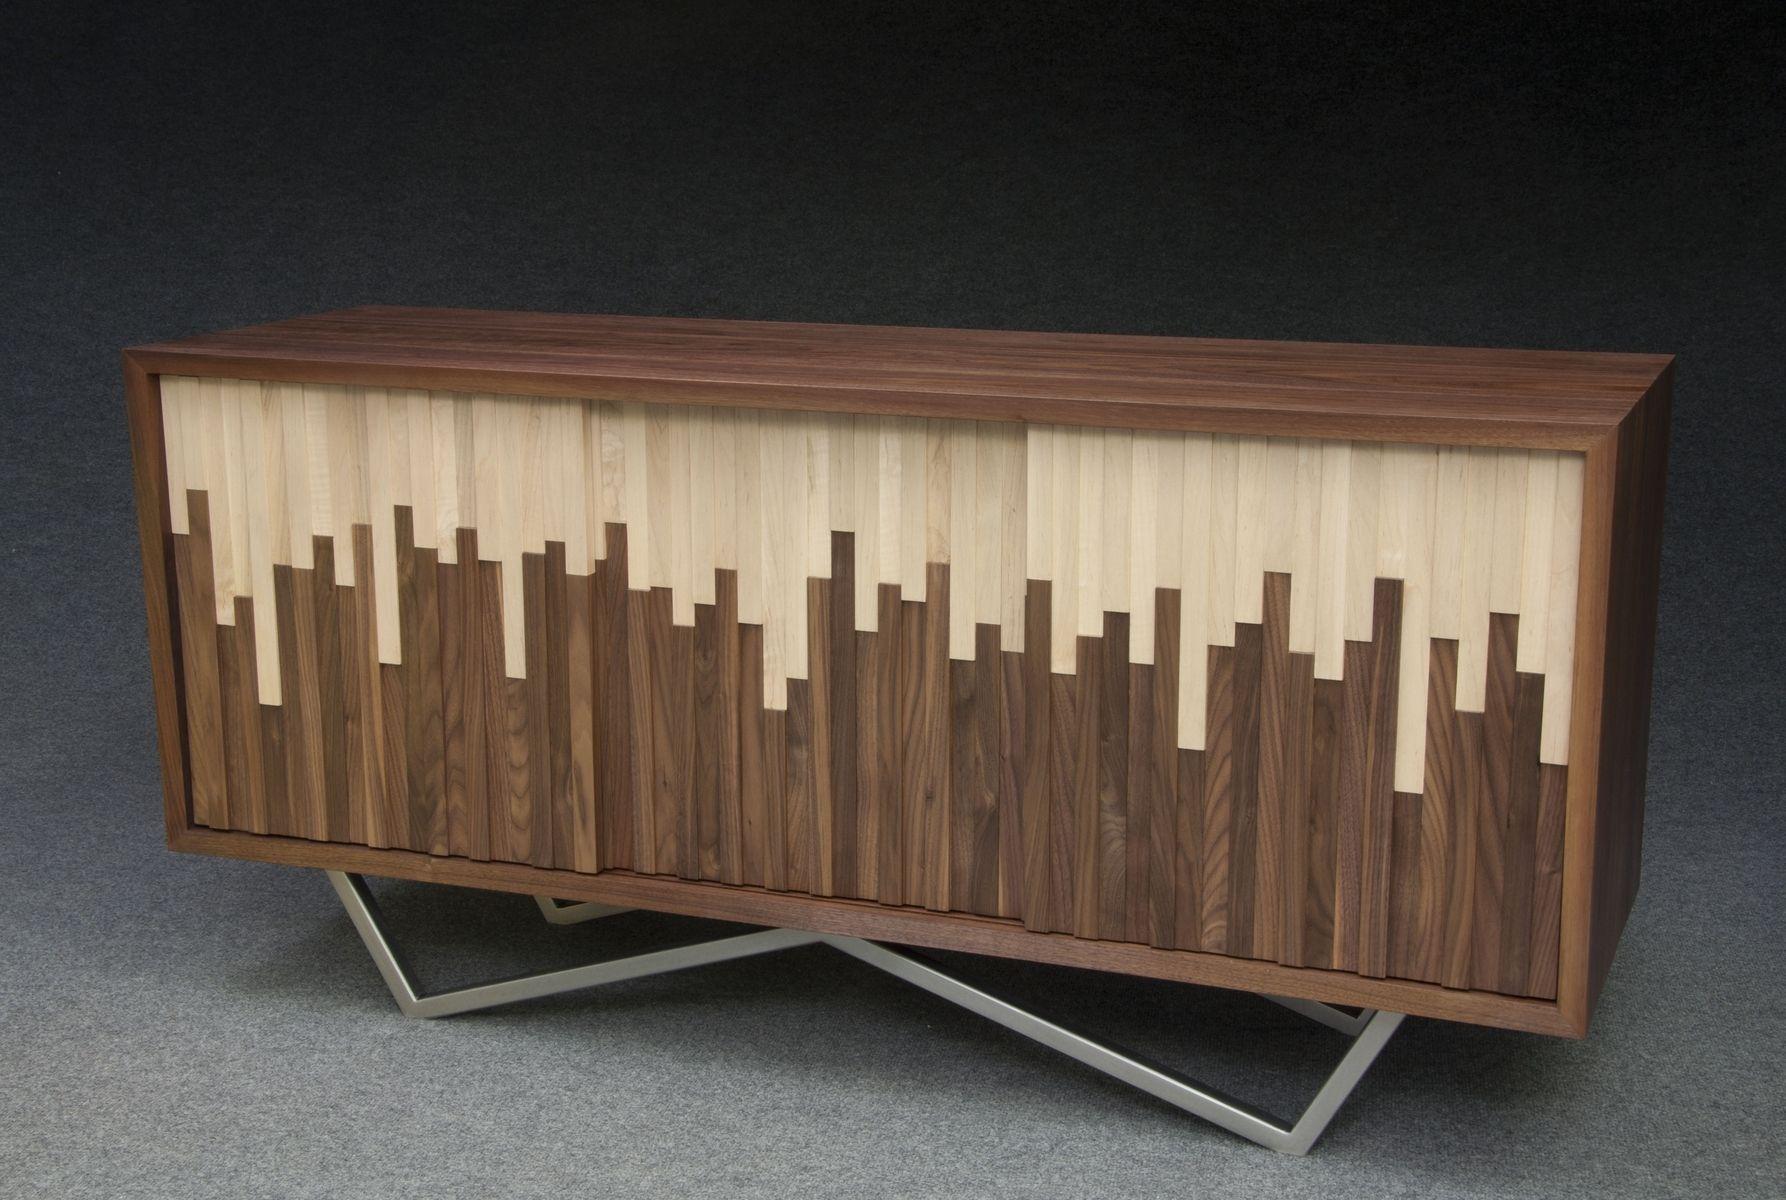 handmade wave credenza by modernist woodworking and furniture. Black Bedroom Furniture Sets. Home Design Ideas